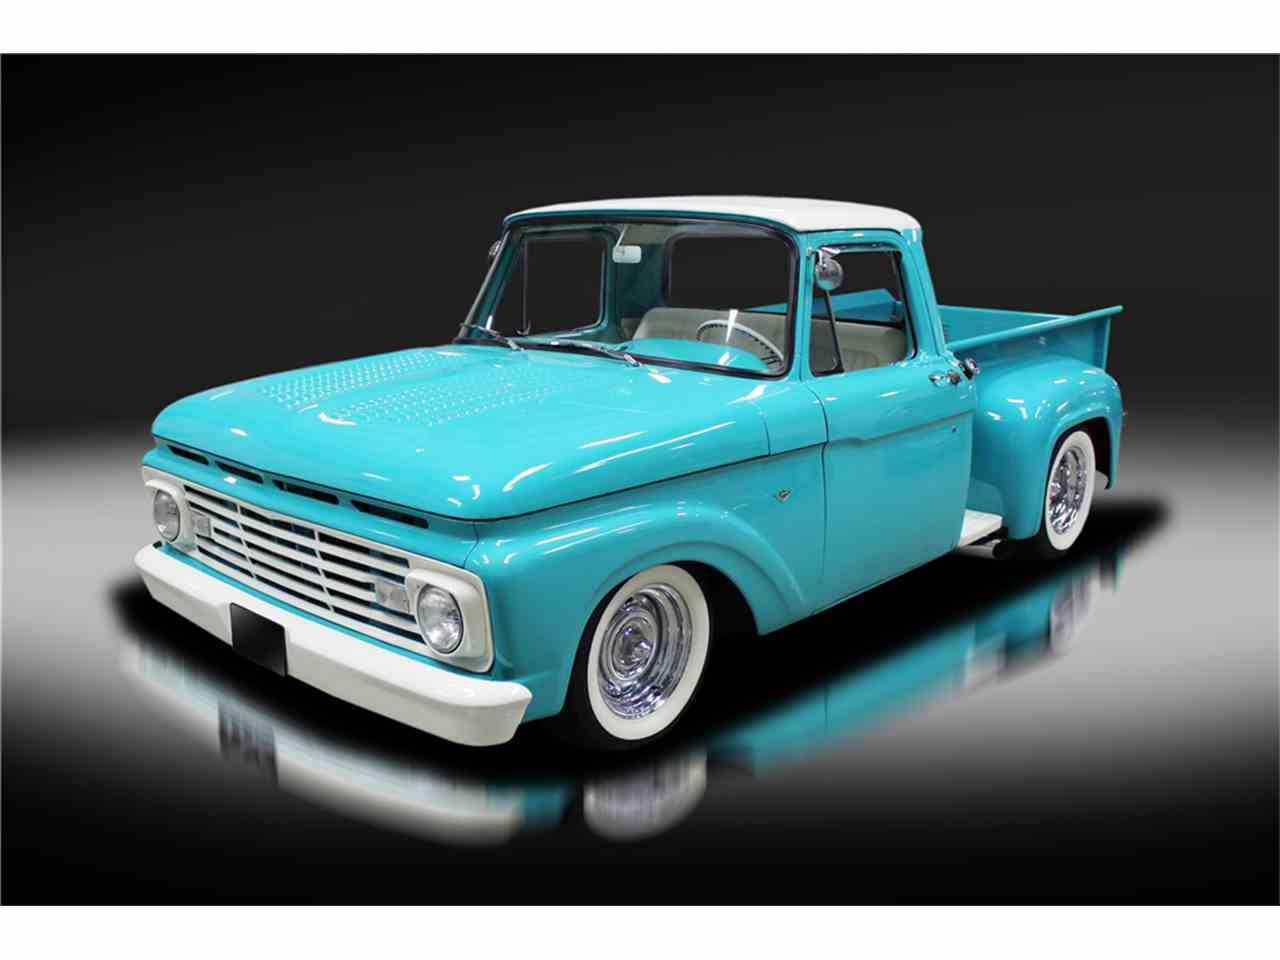 1964 Ford F100 For Sale In Palm Beach Fl F10jh422265 F 100 Custom